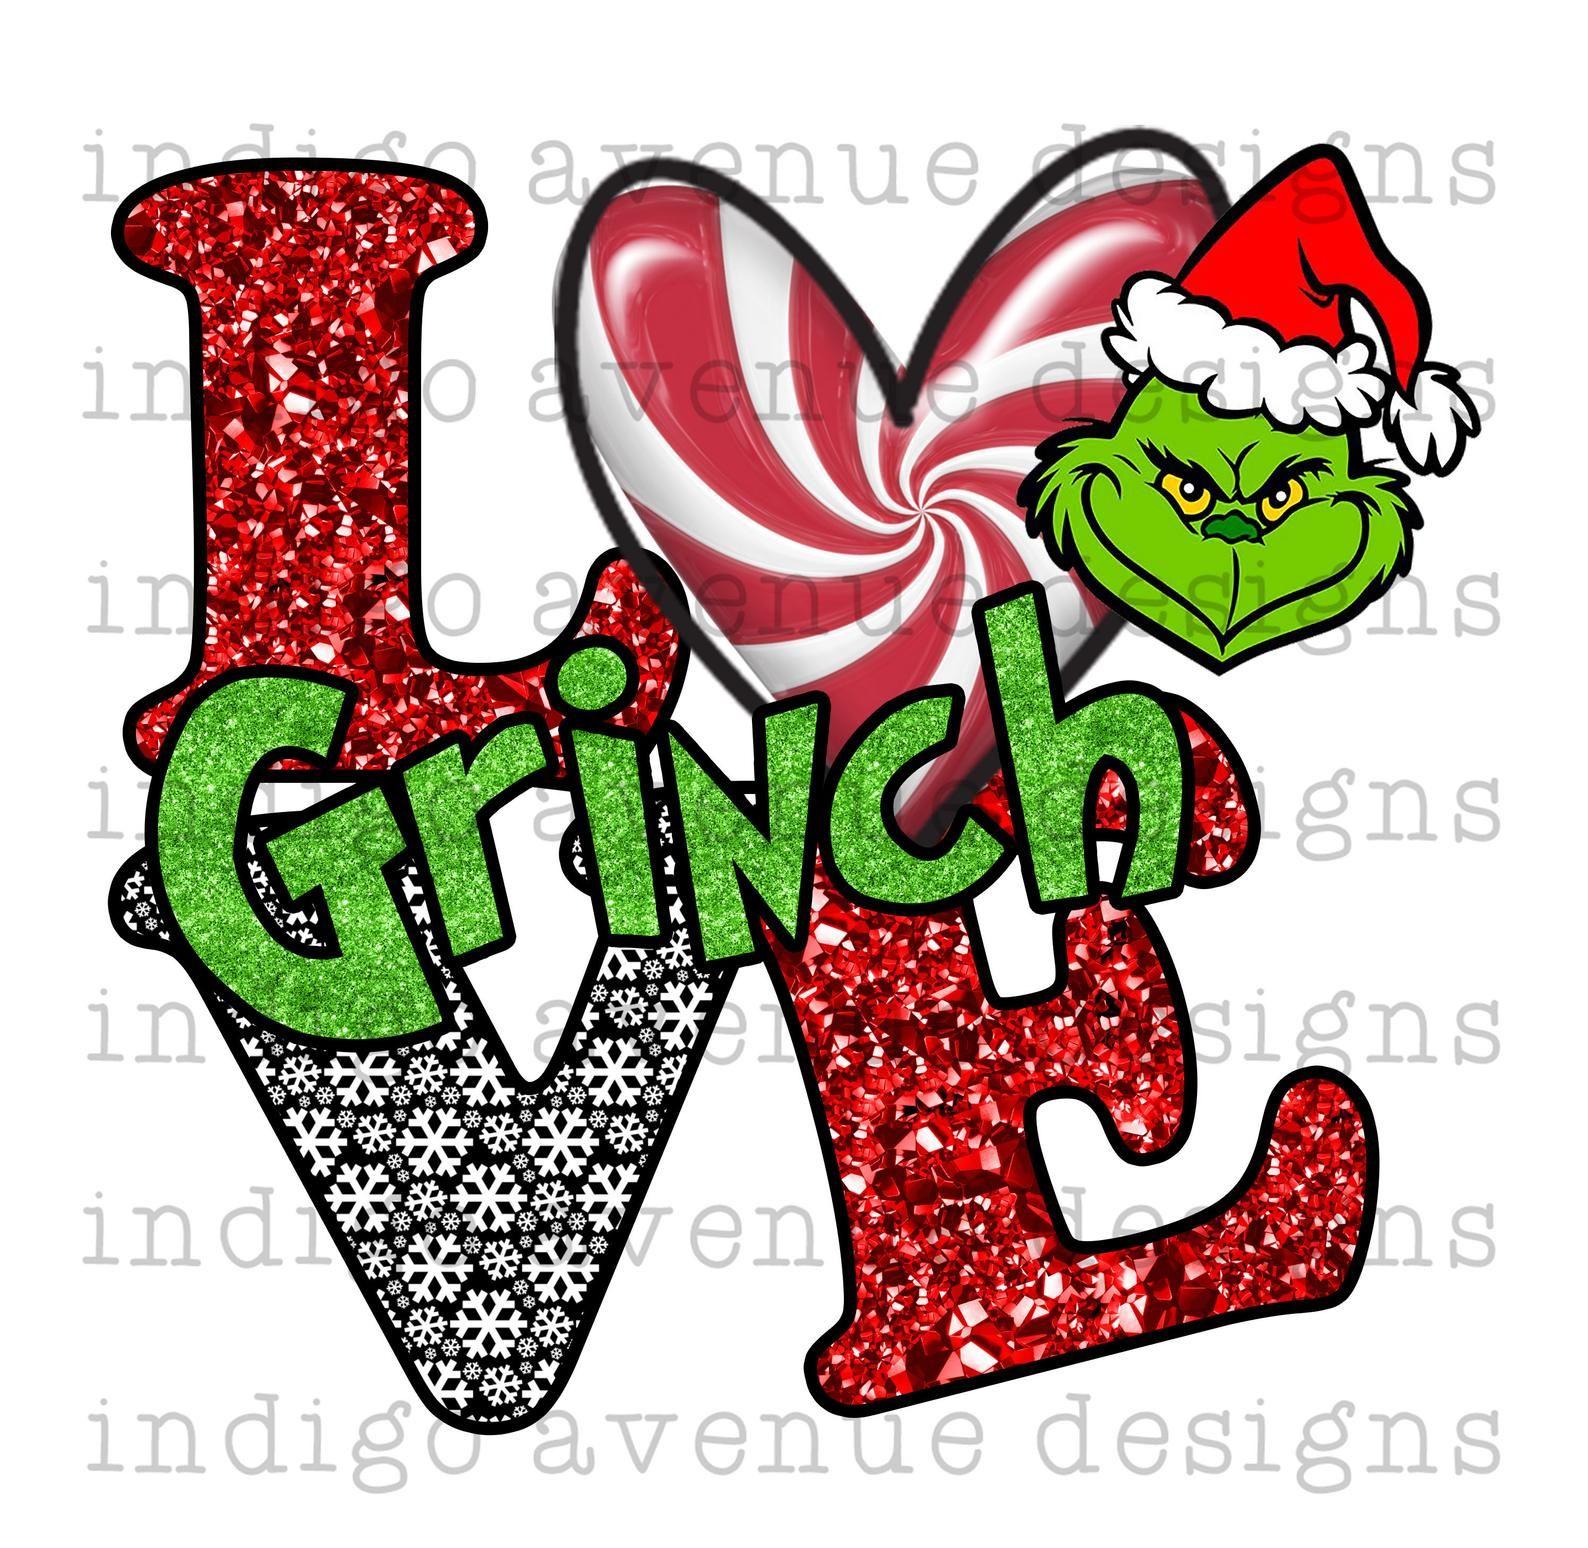 The Grinch File Digital Download I Hate People Grinch Lover Gifts Sublimation Design Grinch Hate People PNG